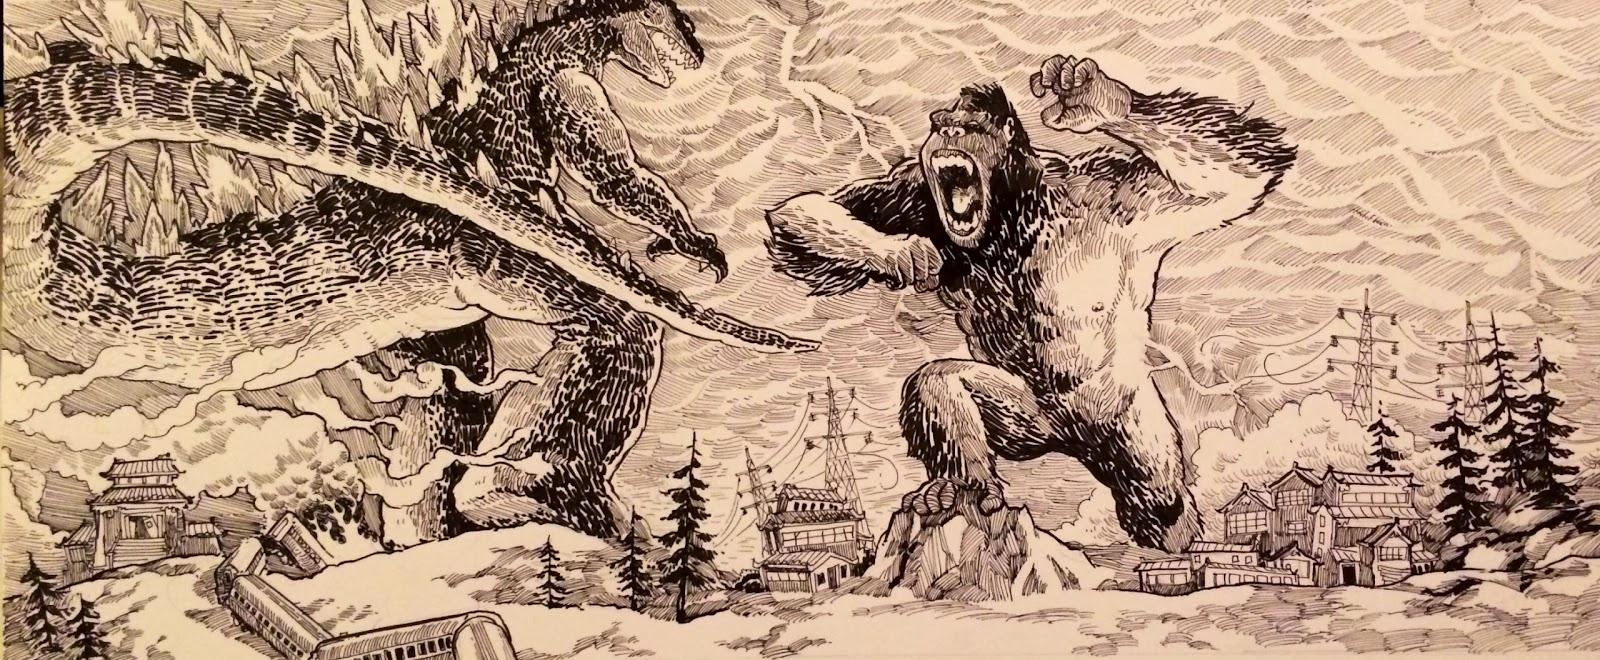 charlie layton draws: Godzilla vs King Kong